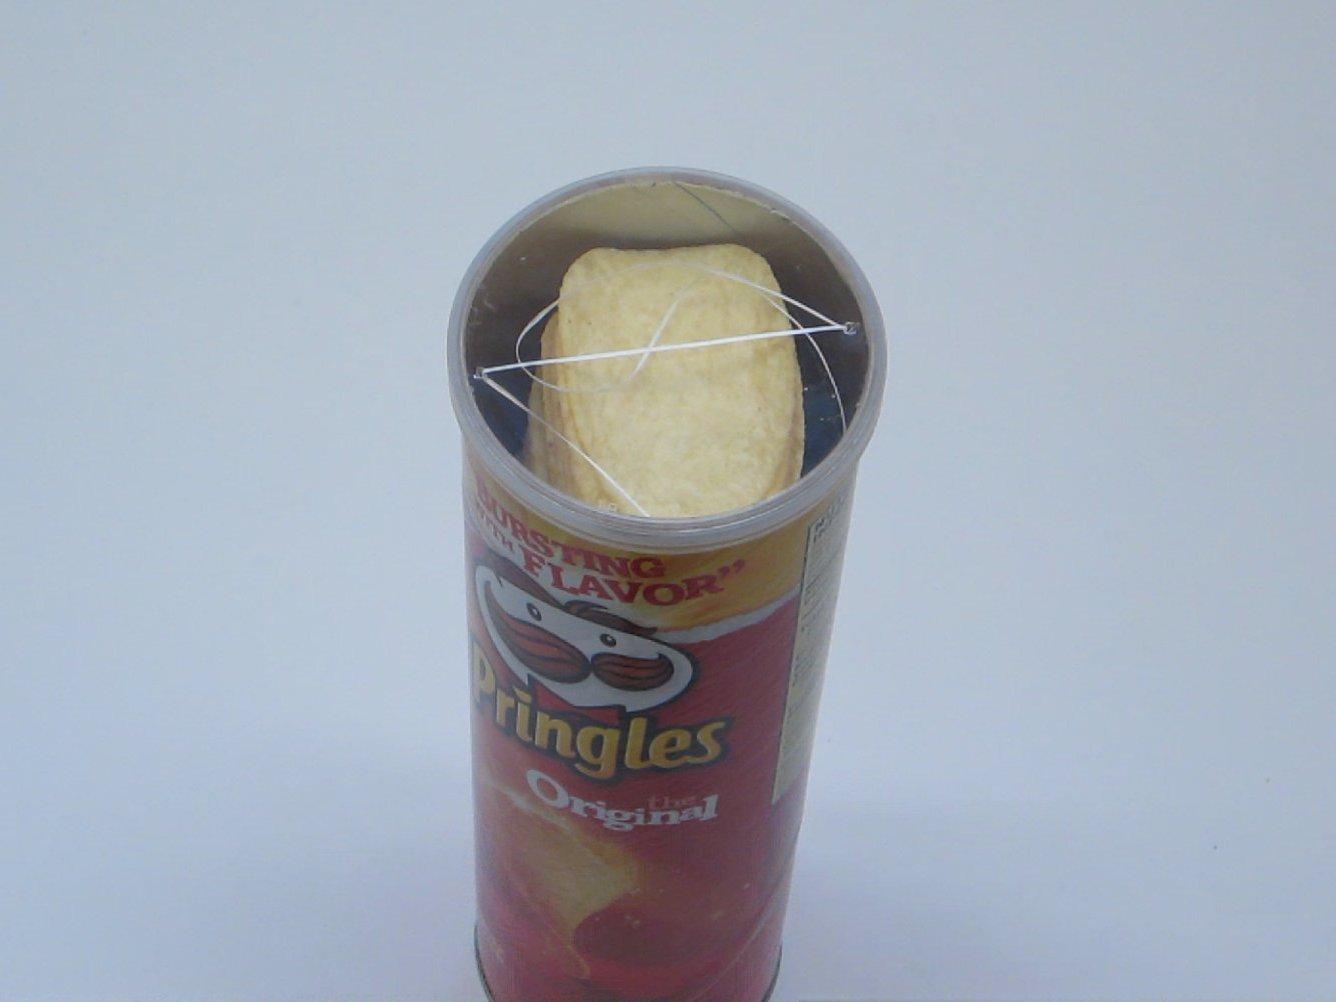 A Better PringlesCan